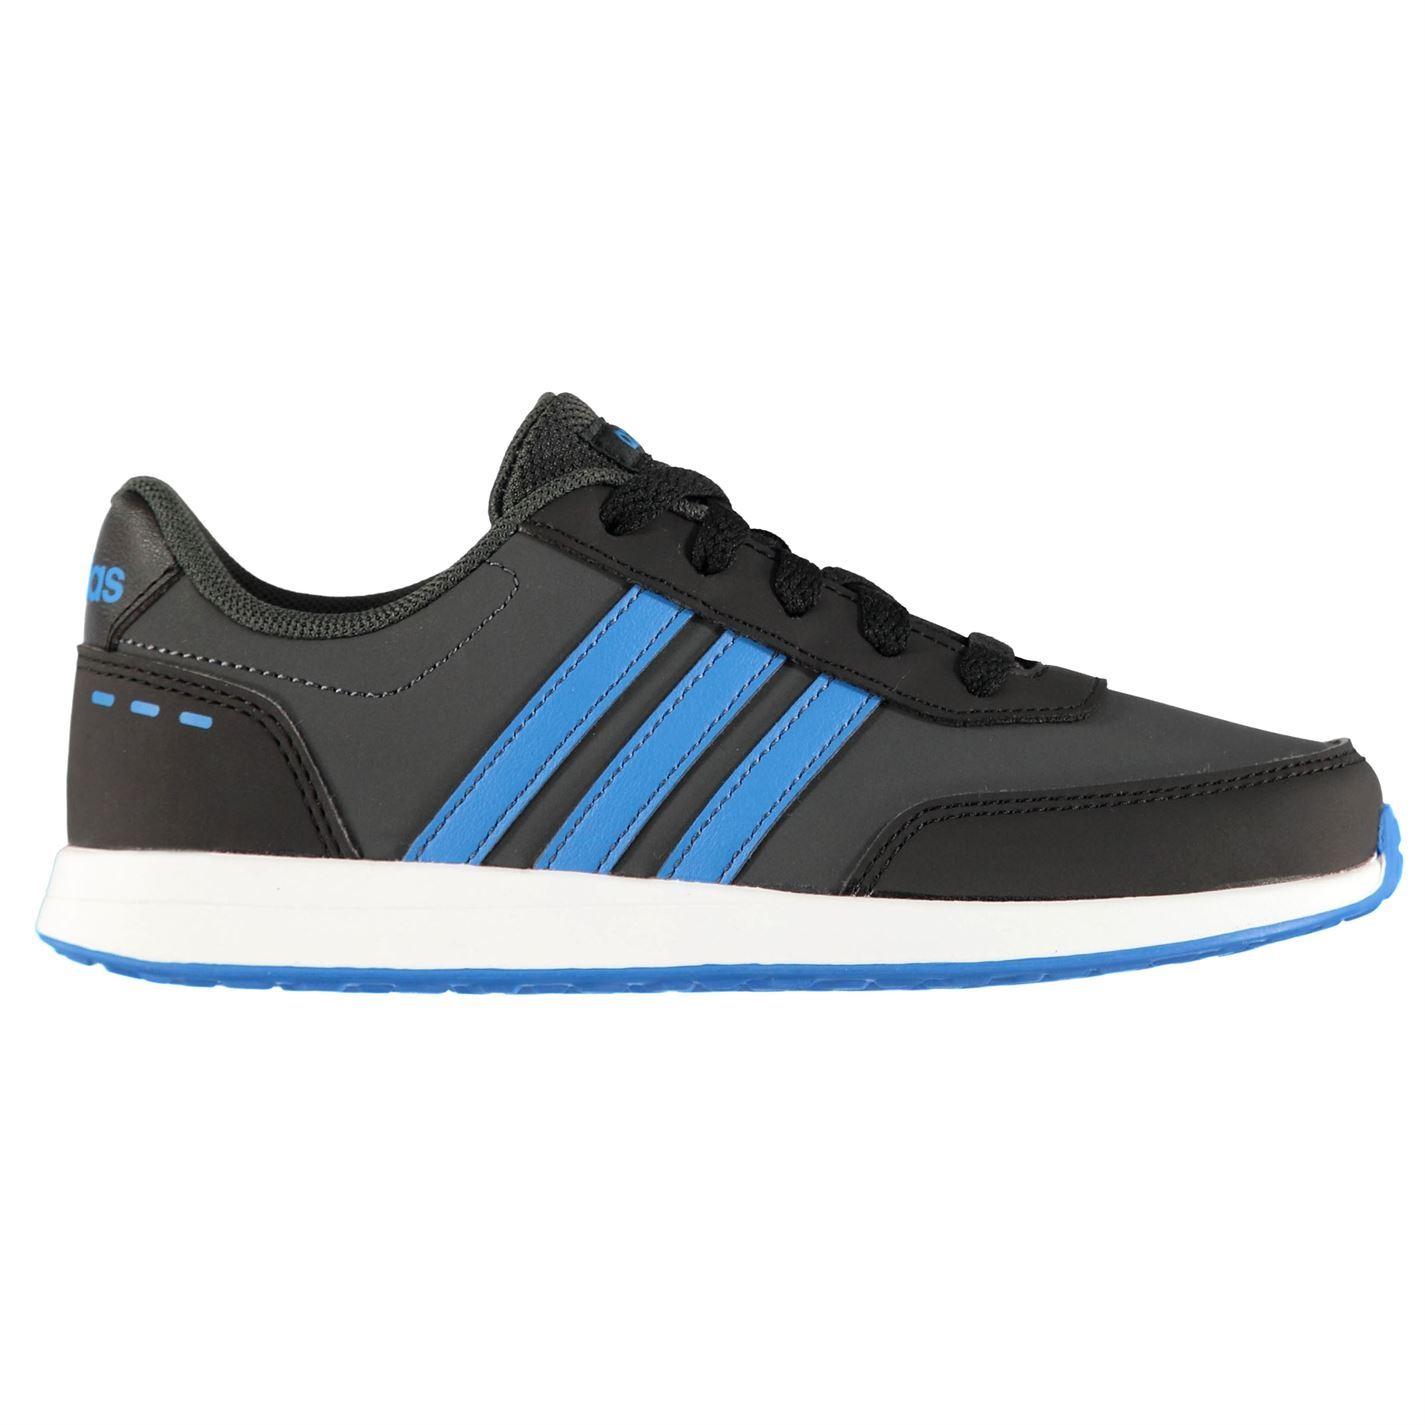 miniatura 12 - ADIDAS-Switch-Nubuck-Scarpe-da-ginnastica-bambino-ragazzo-calzature